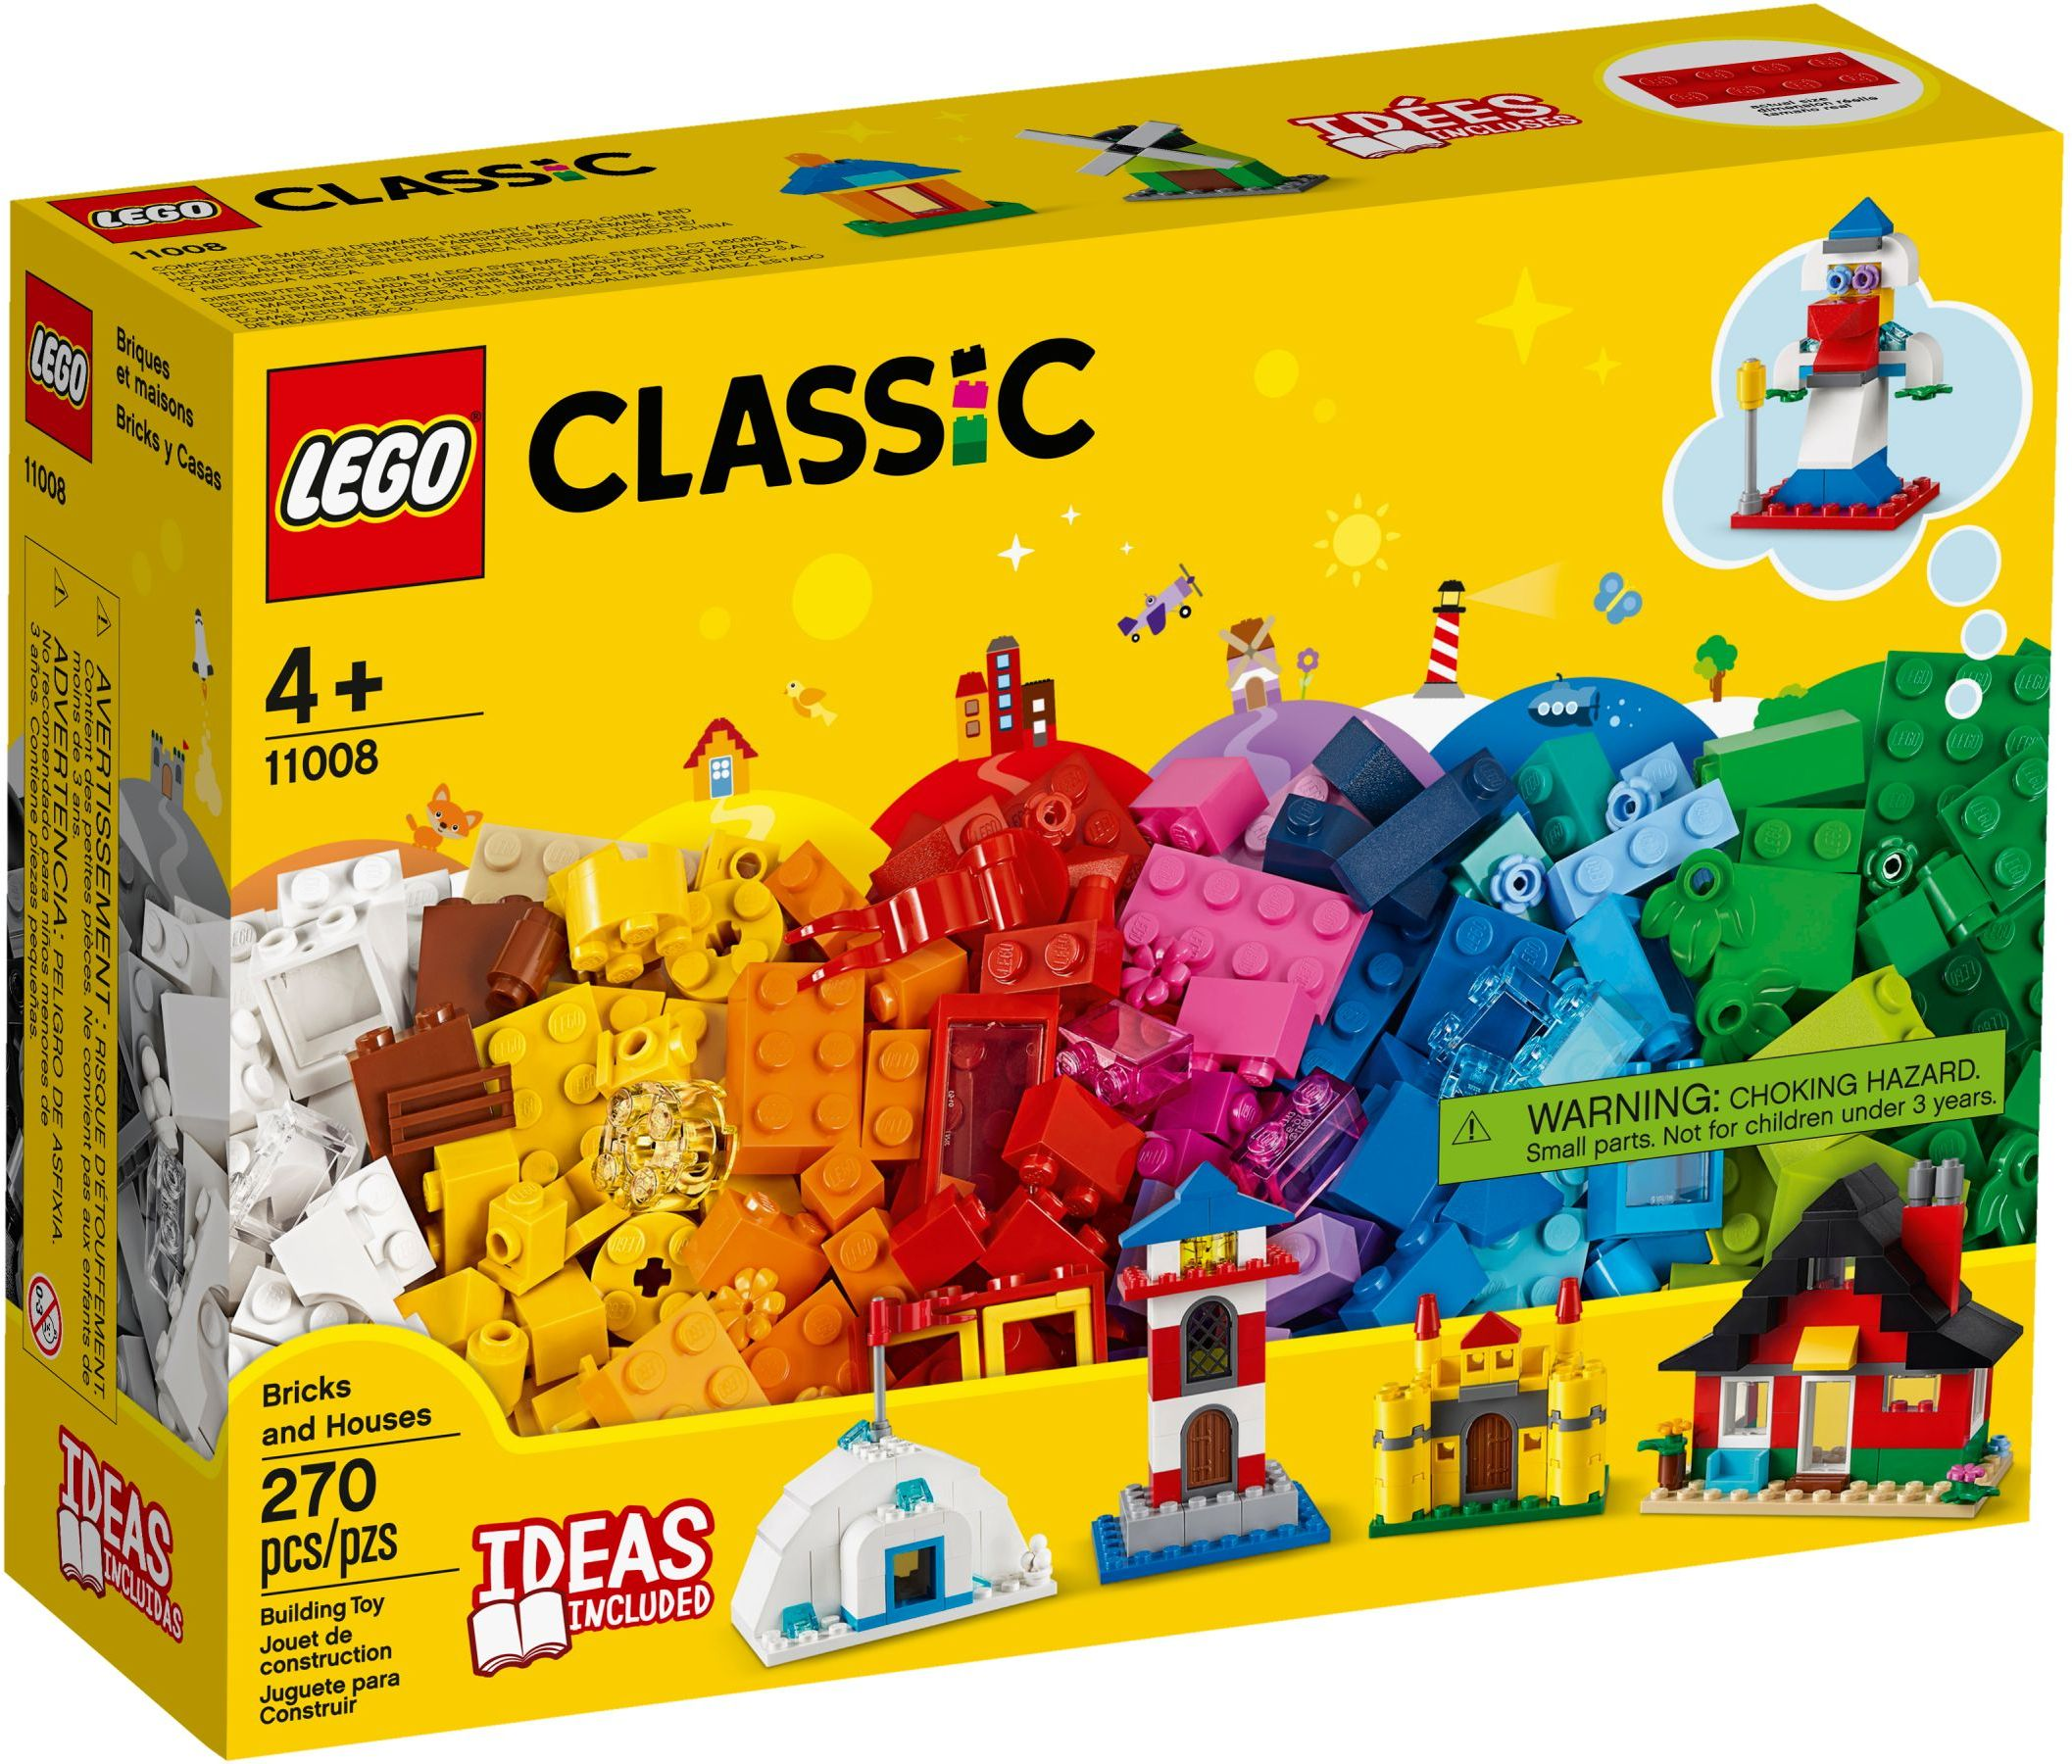 LEGO Classic - Bricks and Houses (11008)